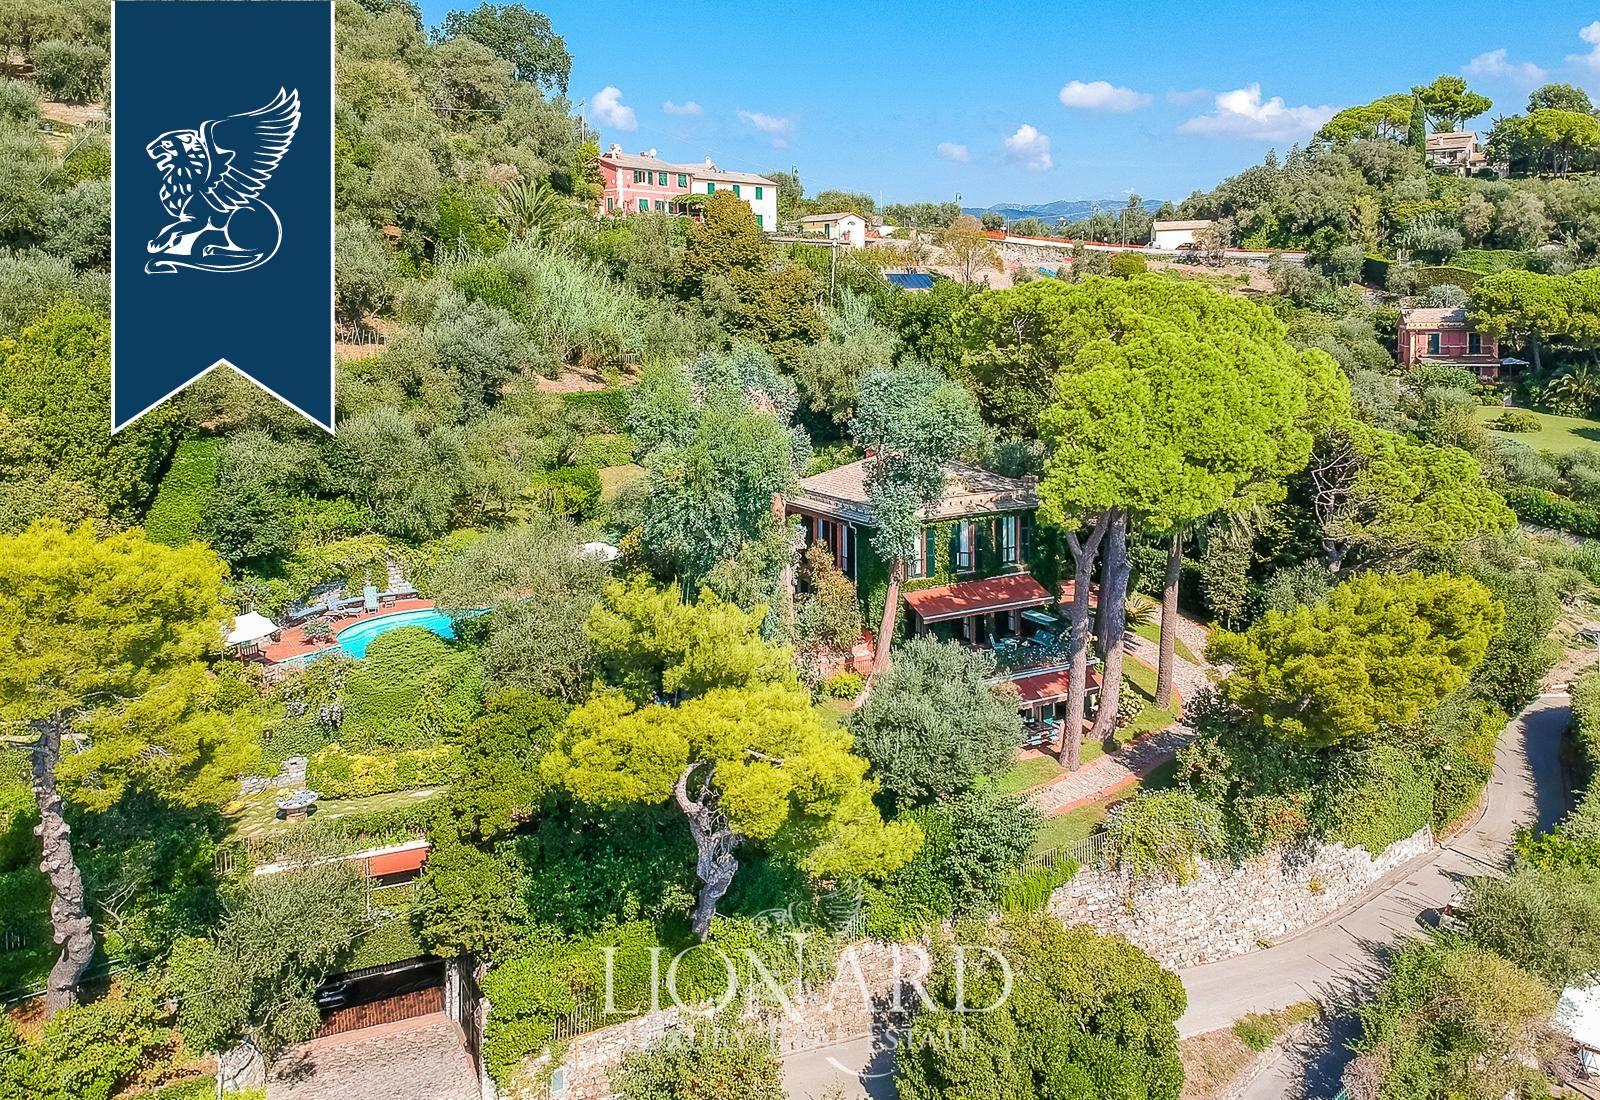 Villa in Vendita a Santa Margherita Ligure: 0 locali, 459 mq - Foto 8